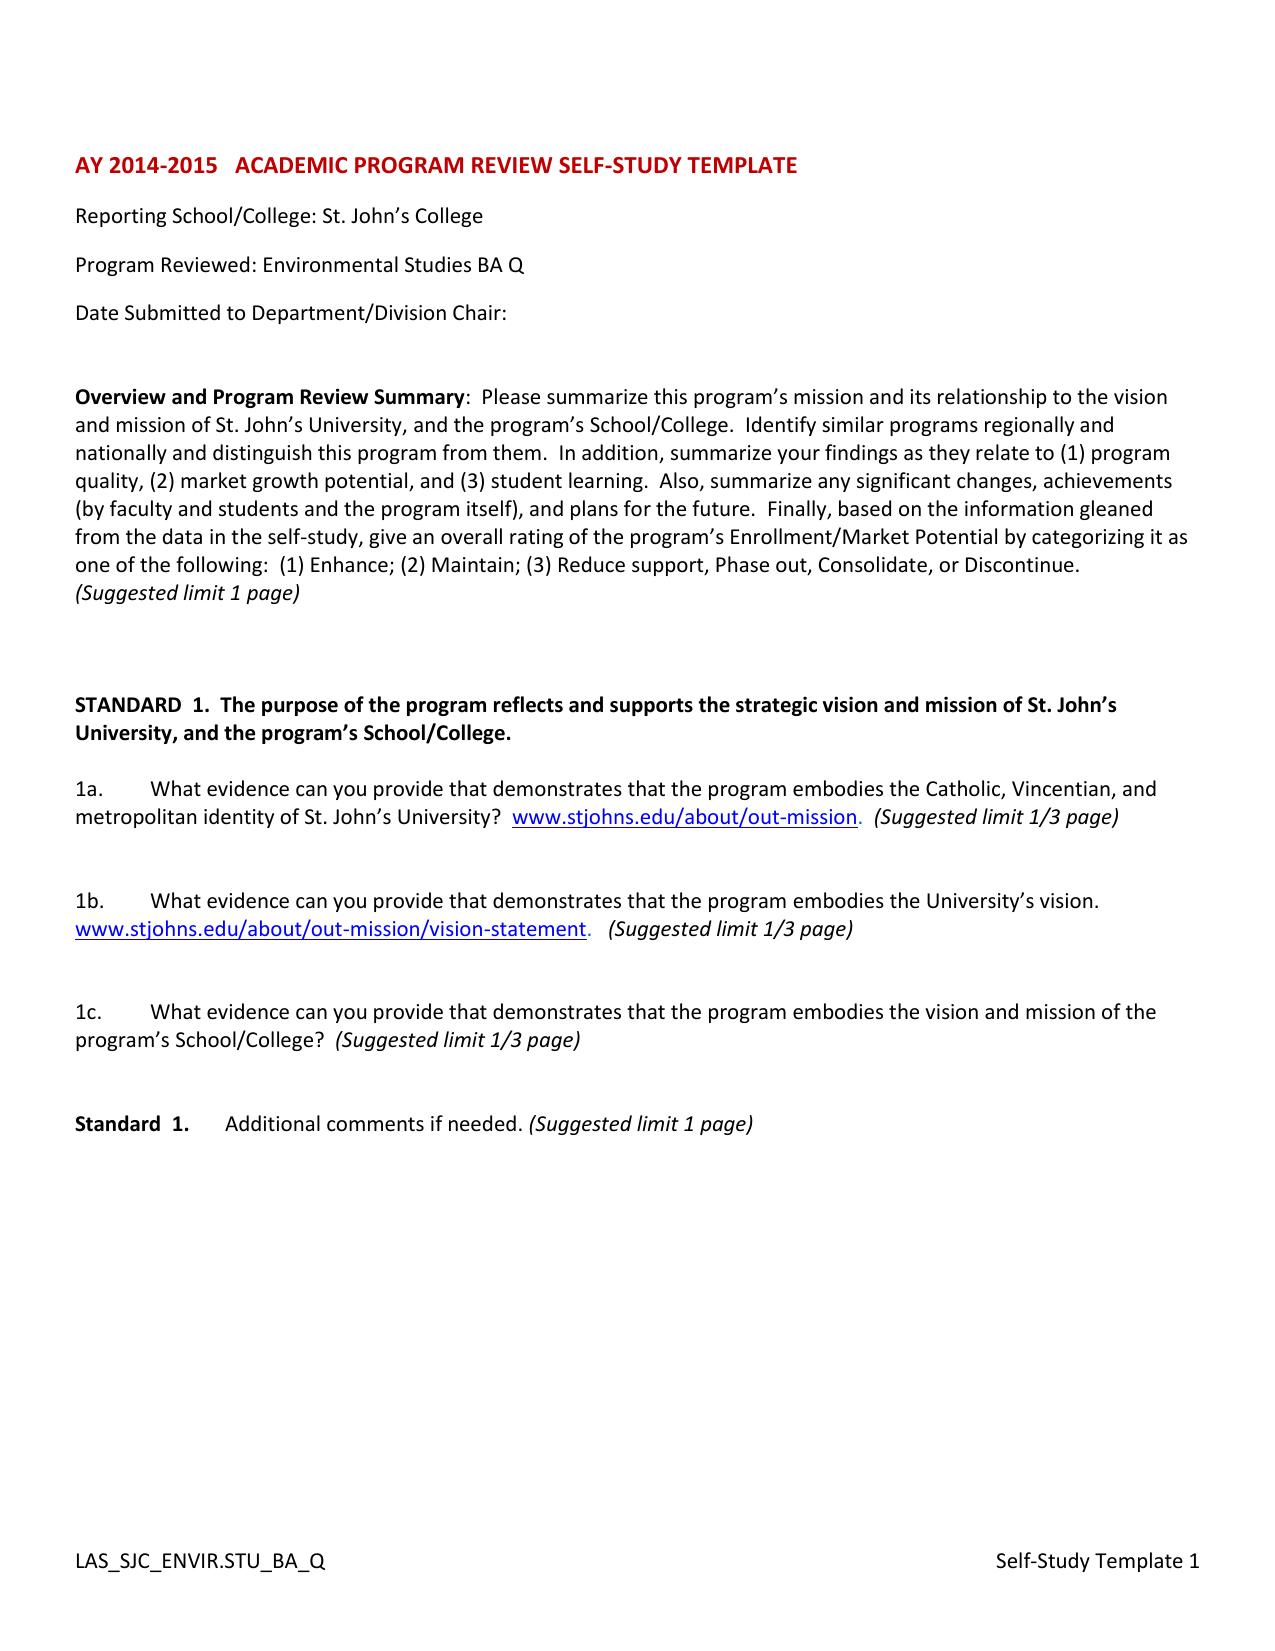 Academic program review external reviewers report template pdf.